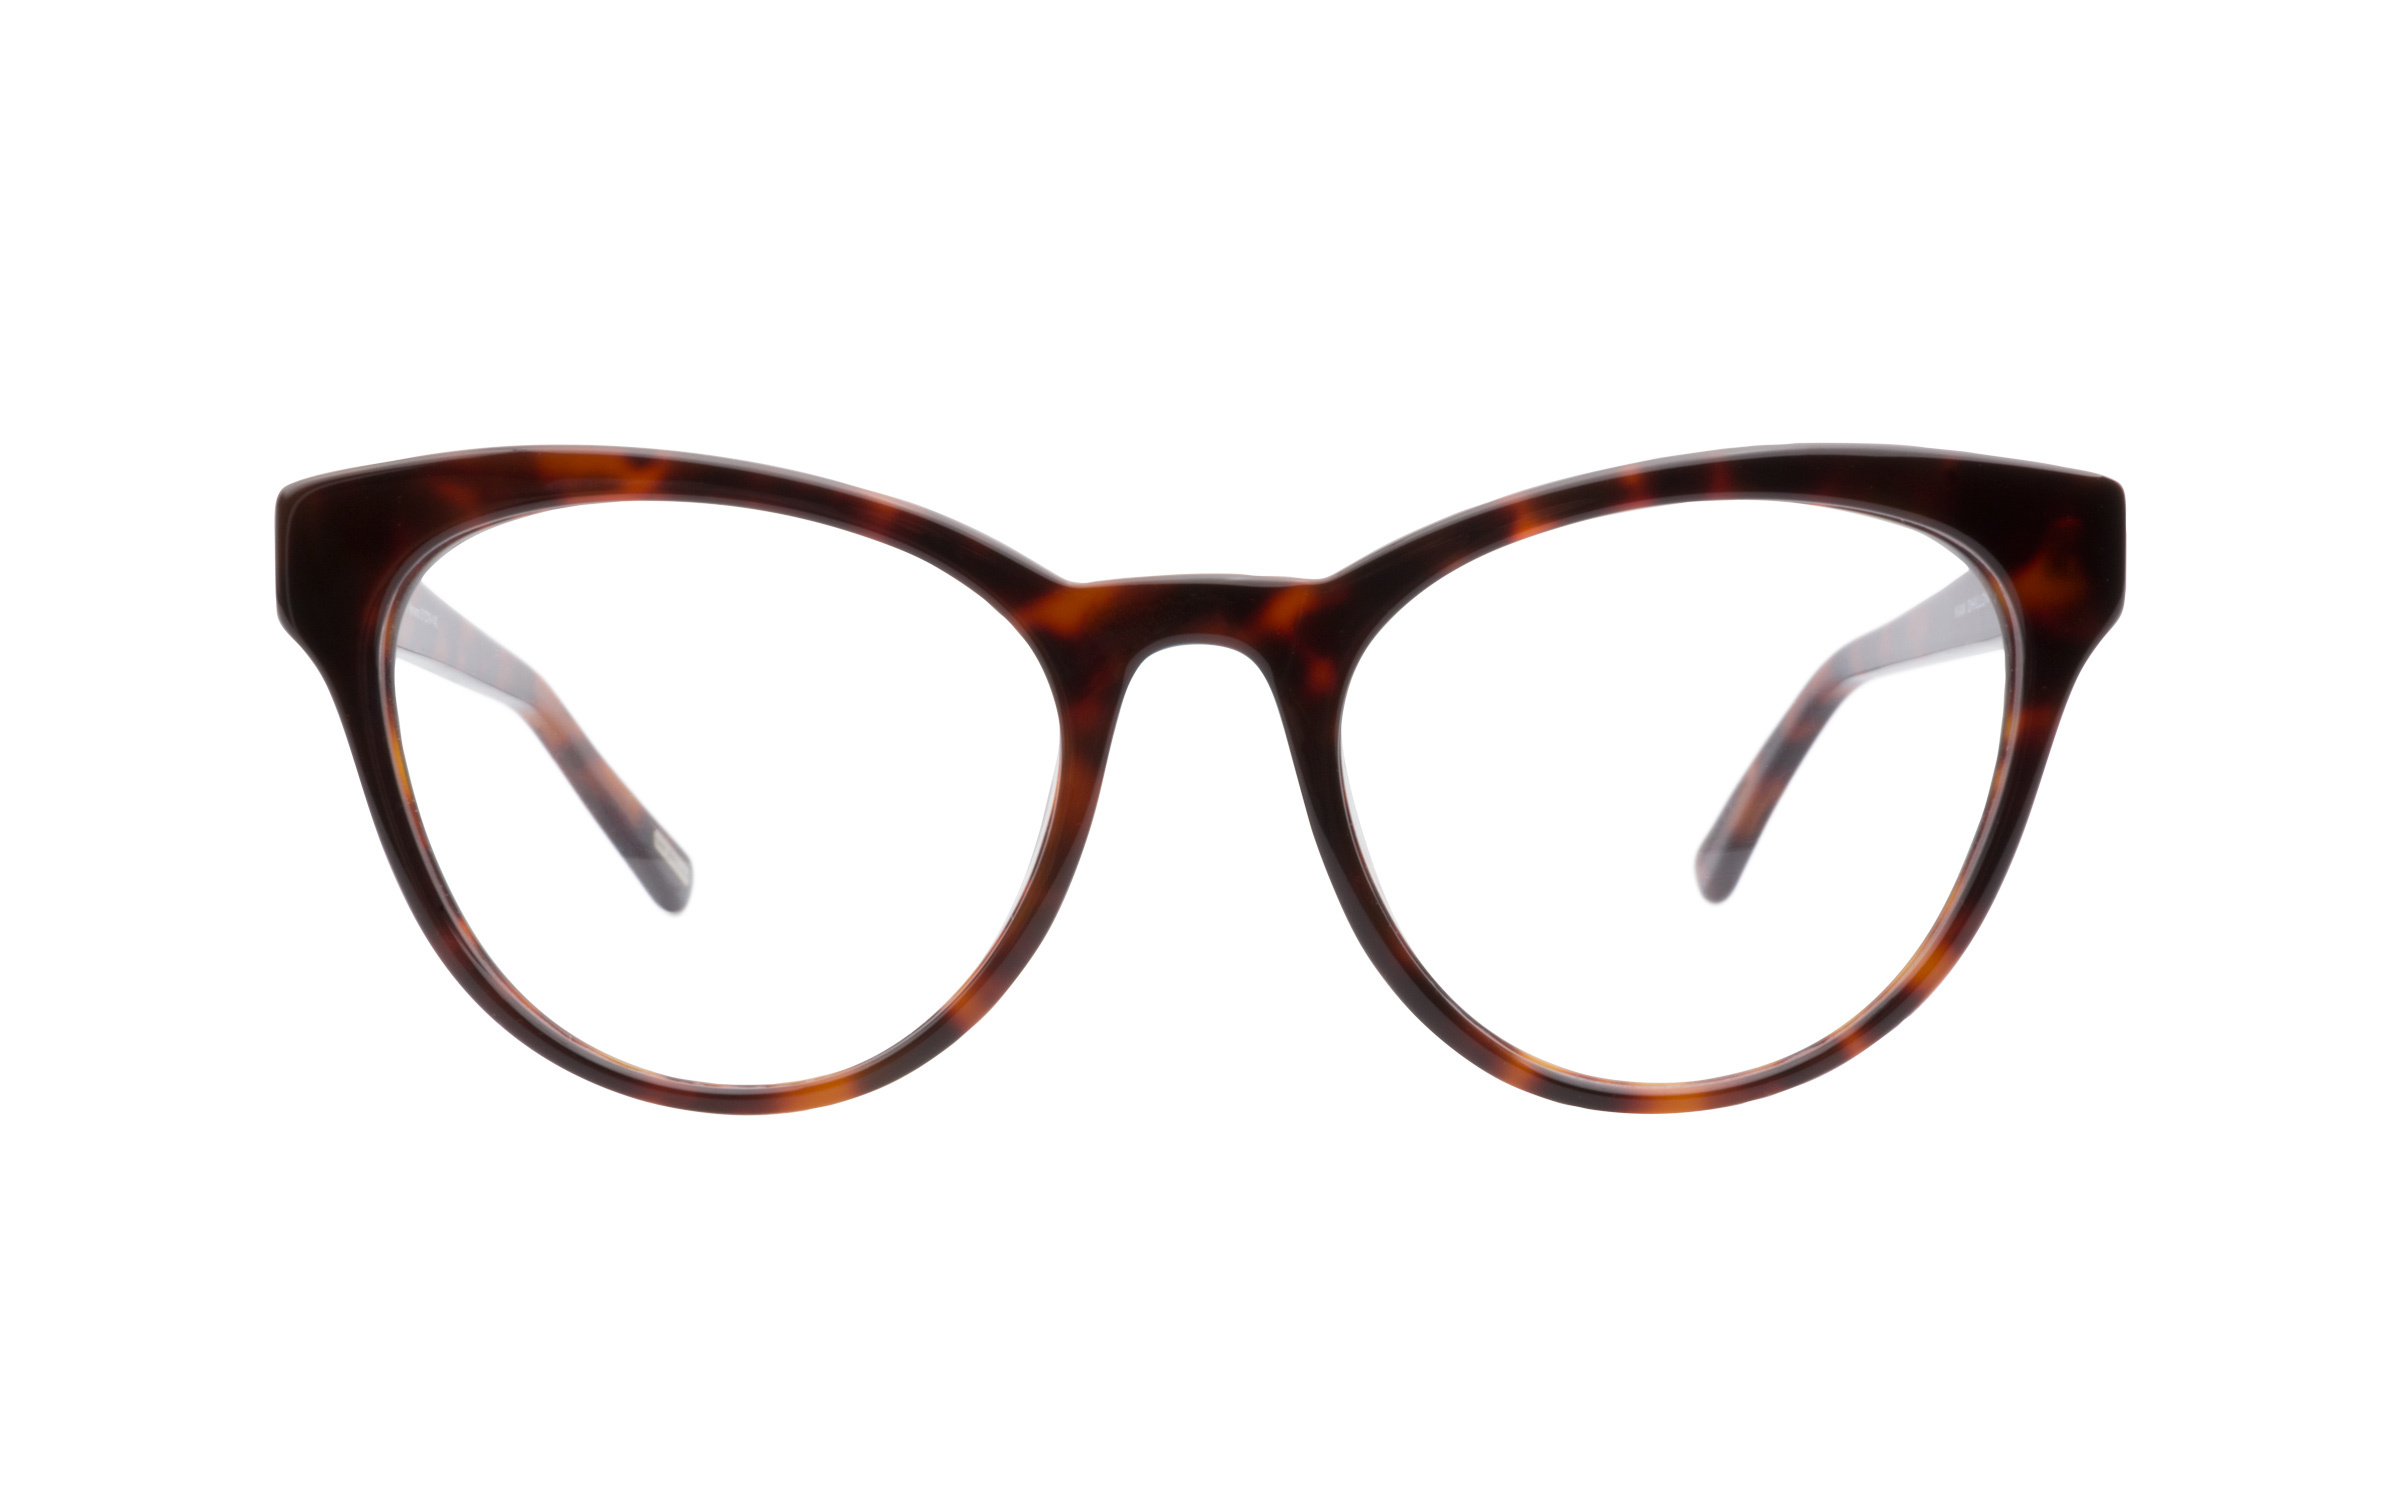 Womens_Havana_Tortoise_AcetateMetal_Cathi_Kam_Dhillon_Glasses__Clearly_Glasses_Online